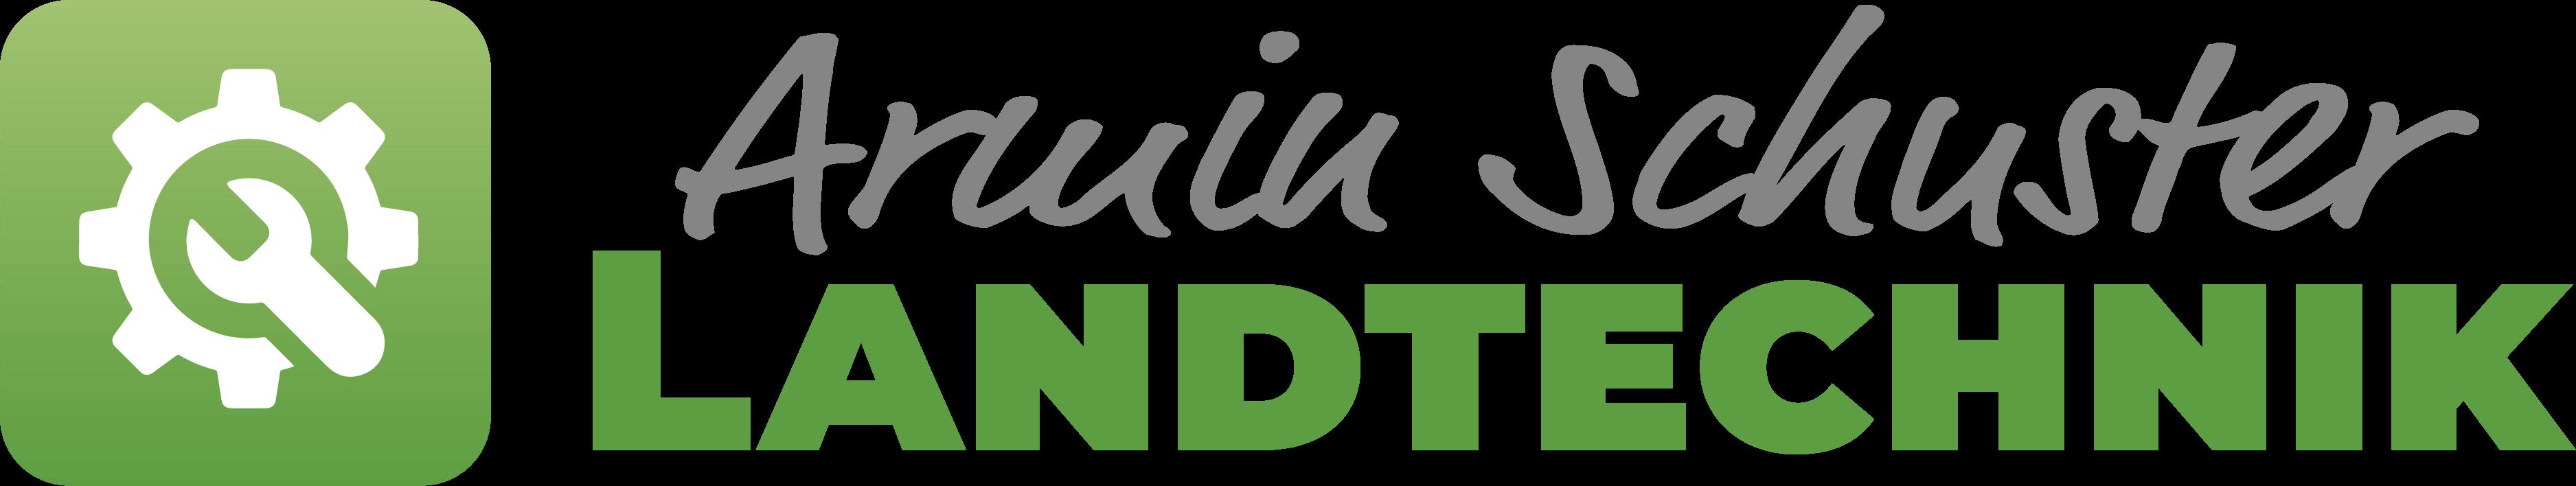 Landtechnik Schuster Logo